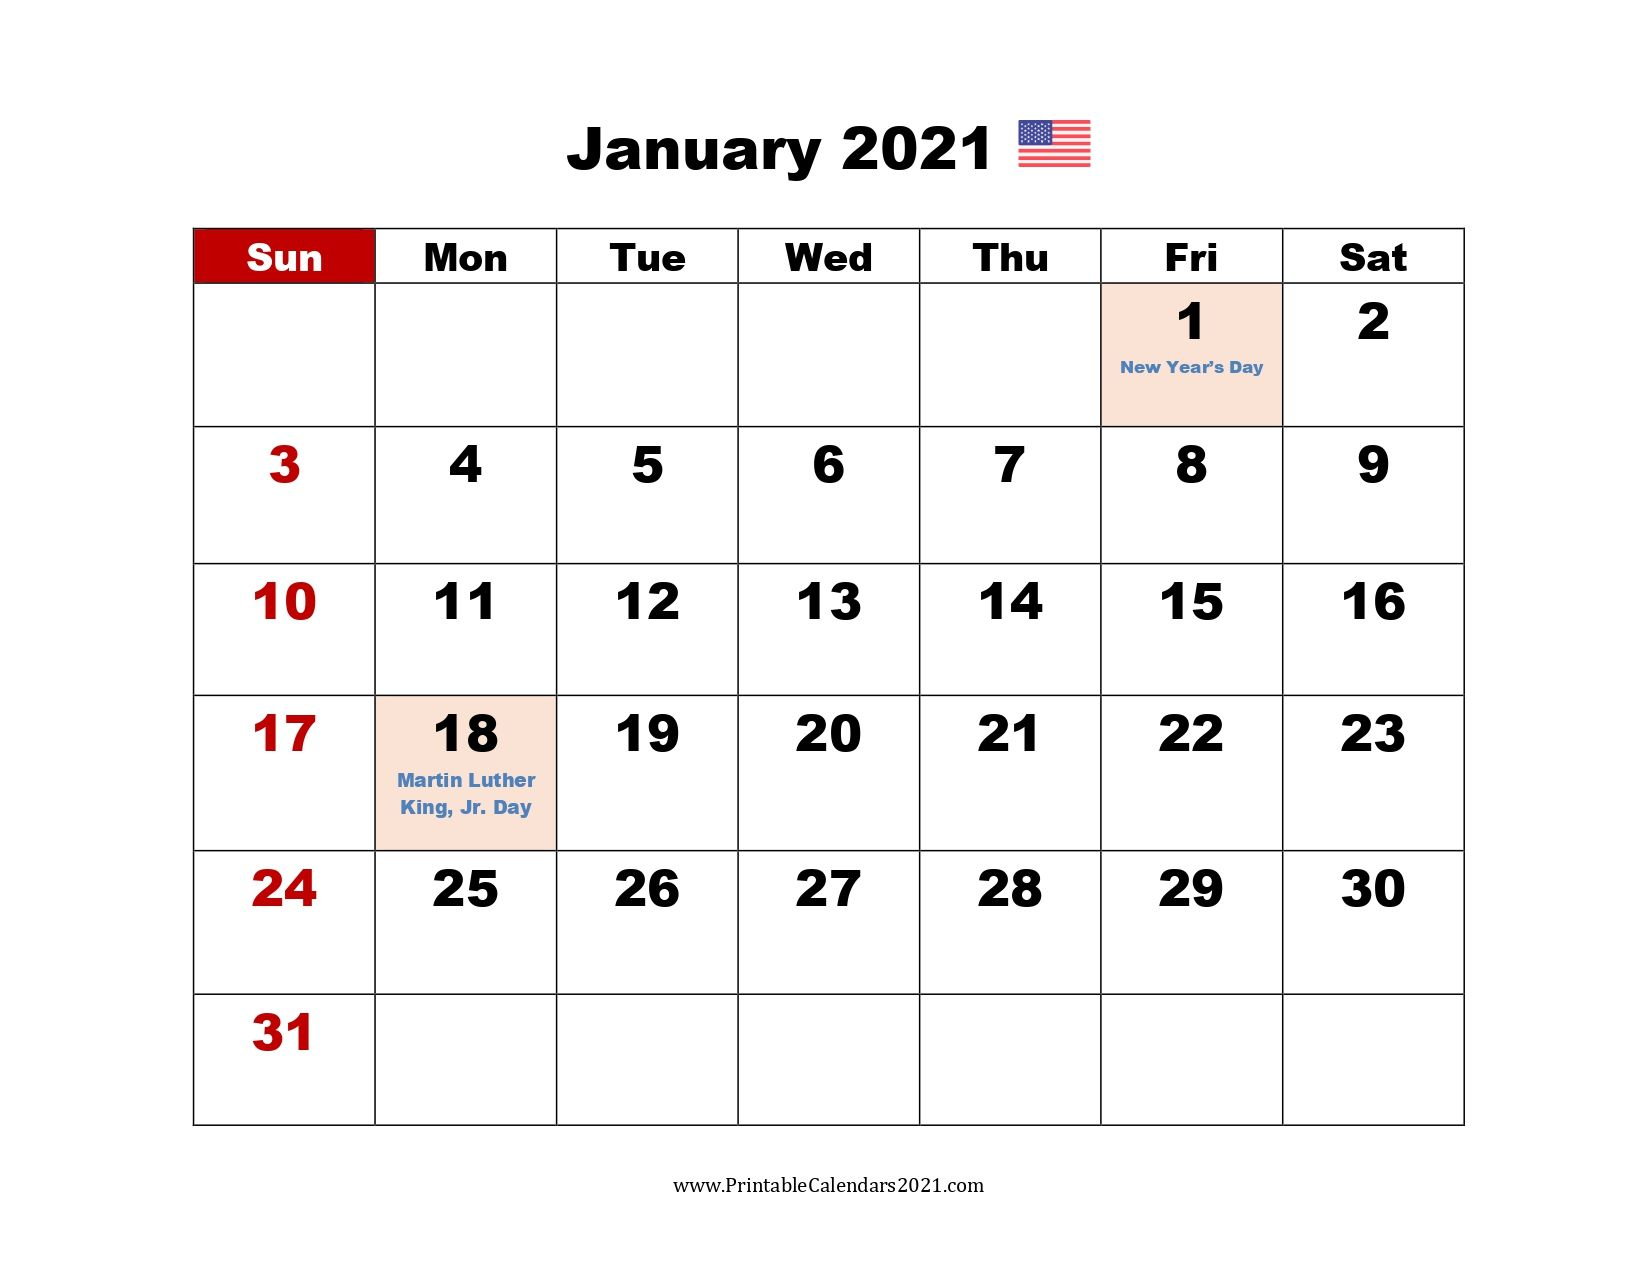 Printable Calendar 2021 January in 2020 | Printable ...